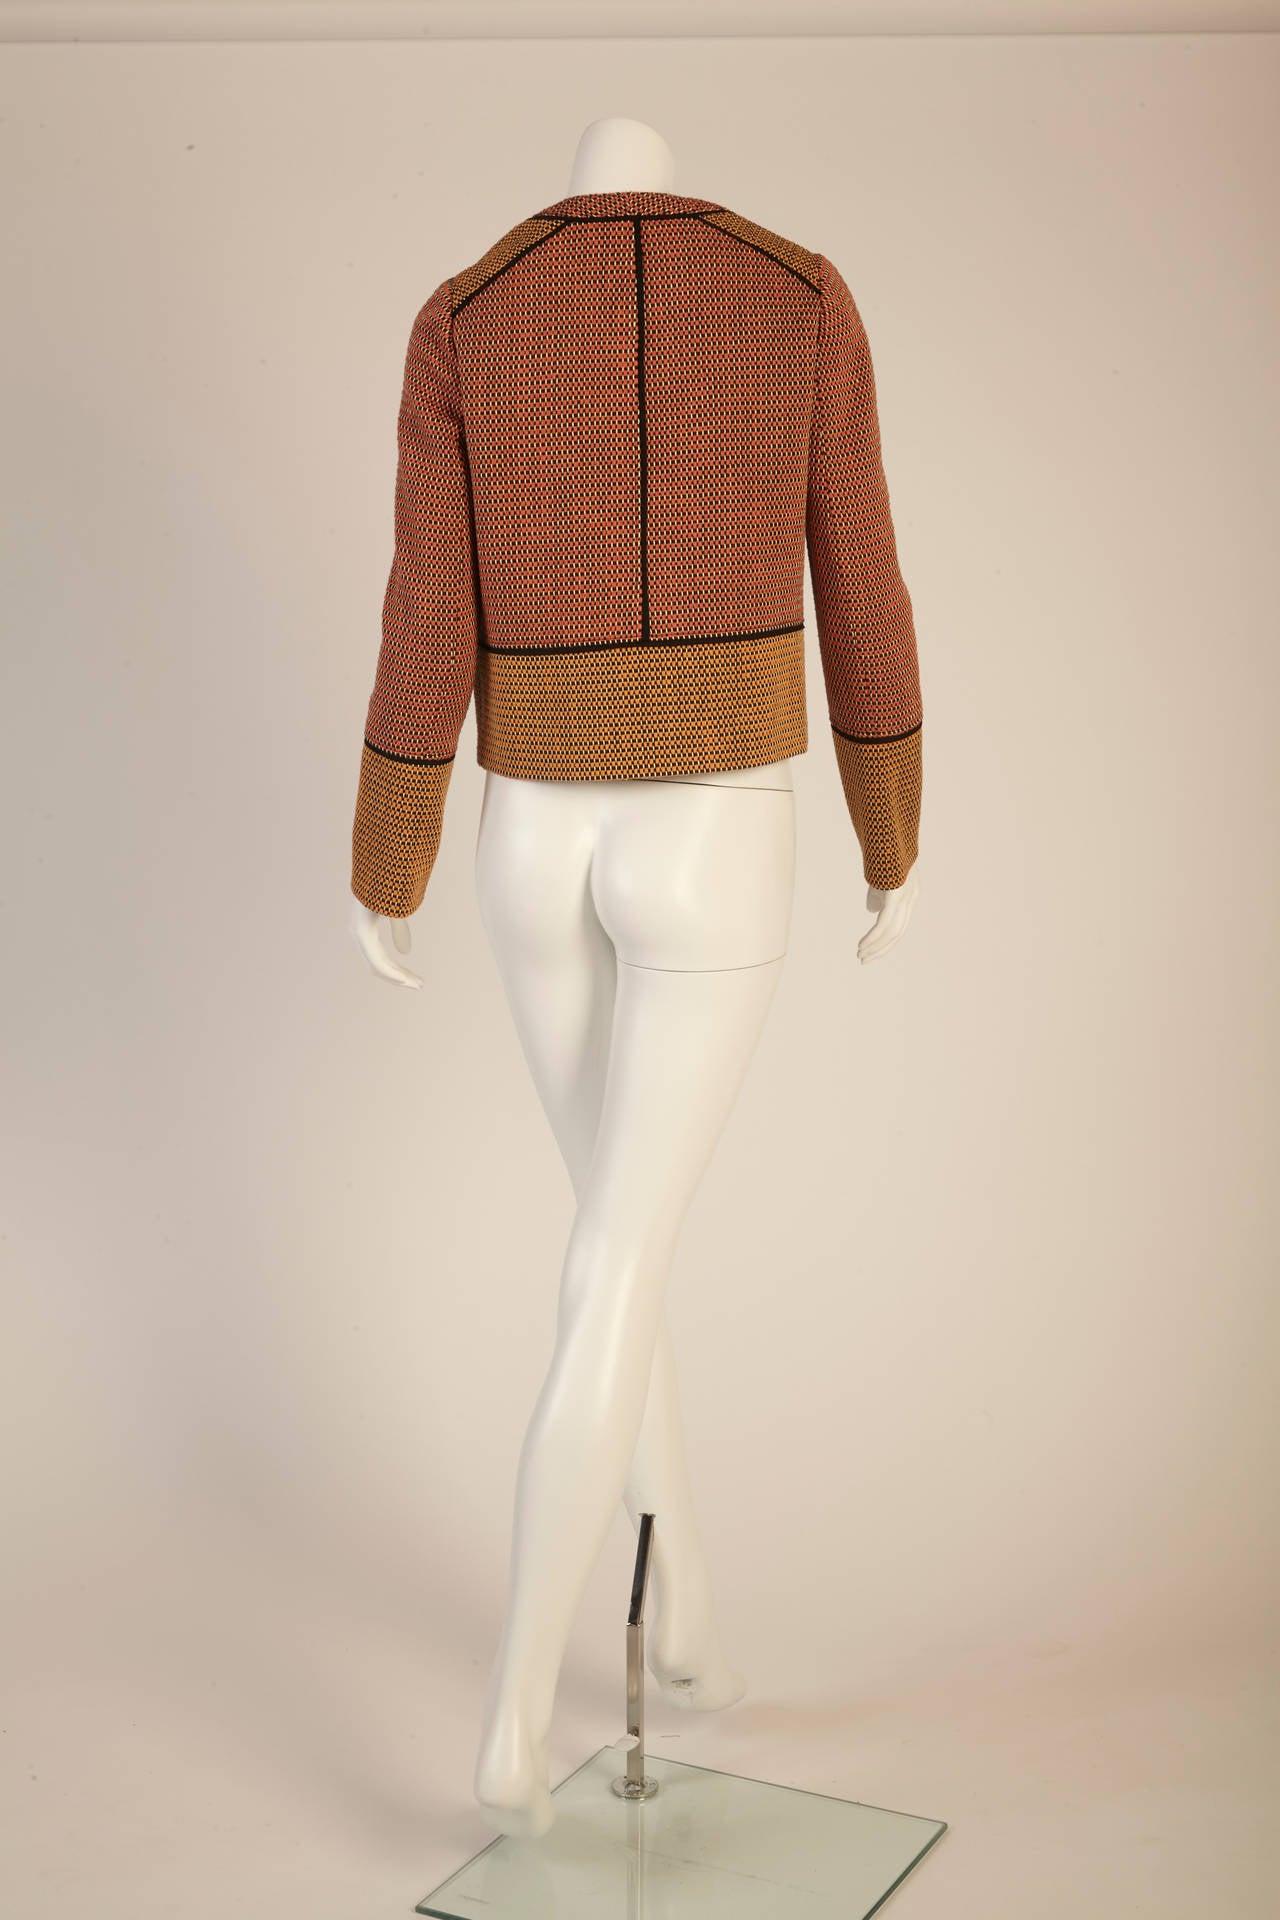 Proenza Schouler Multi-Color Jacket 4